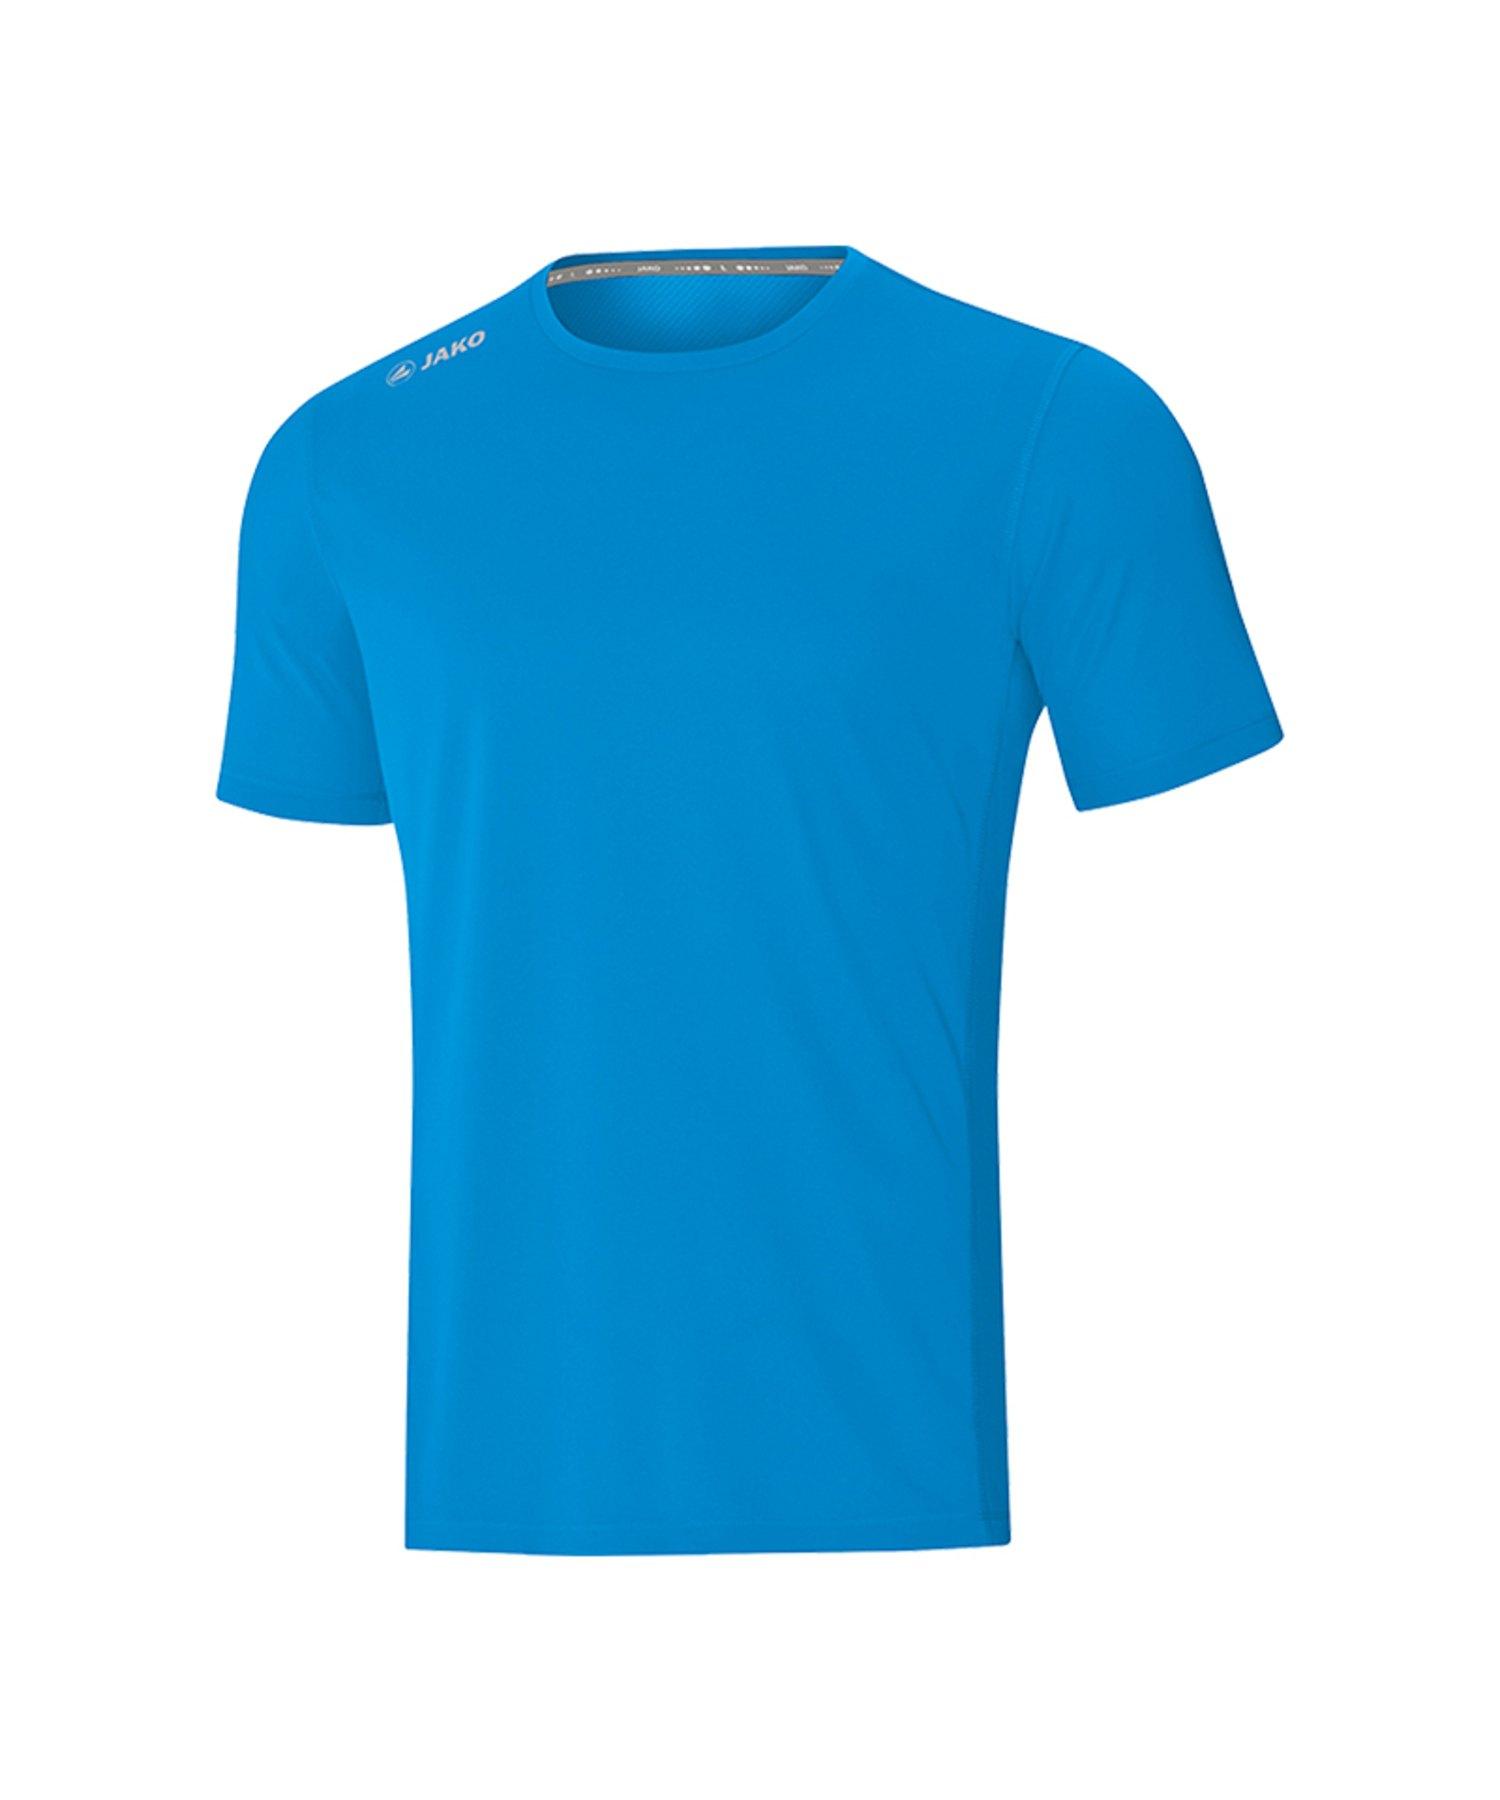 Jako Run 2.0 T-Shirt Running Kids Blau F89 - Blau